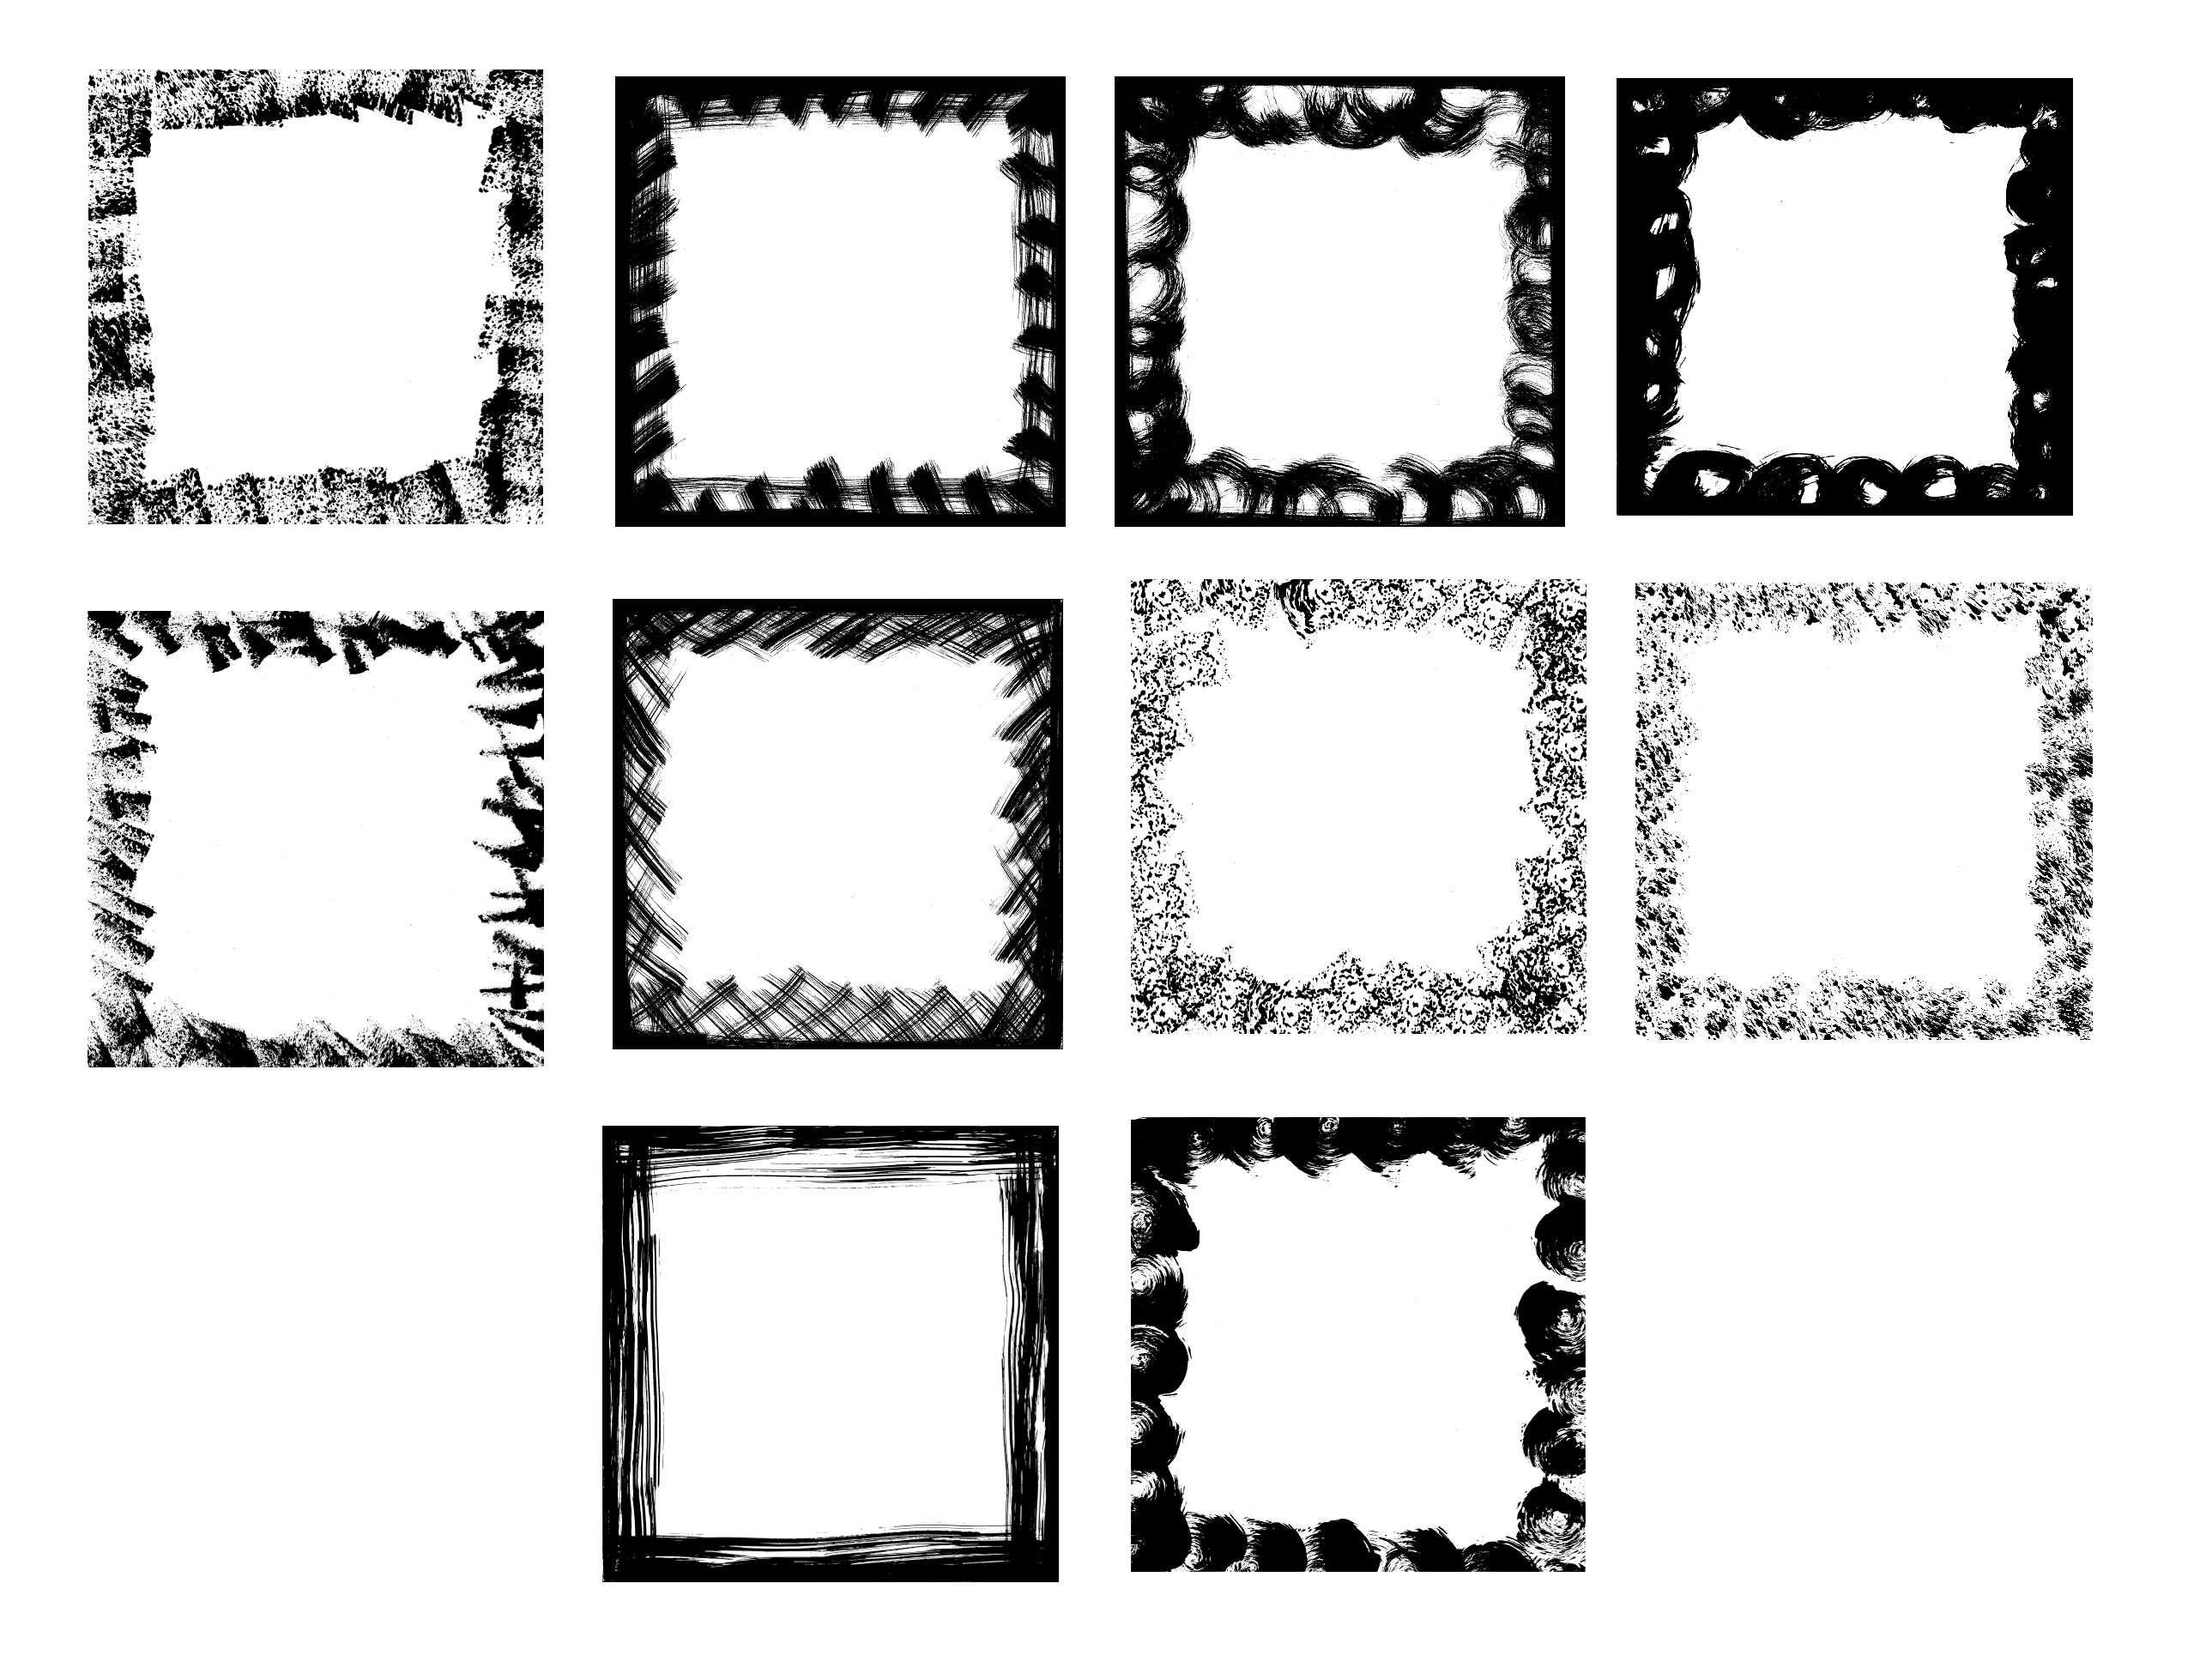 10 Square Grunge Frame (PNG Transparent) Vol. 2 | OnlyGFX.com